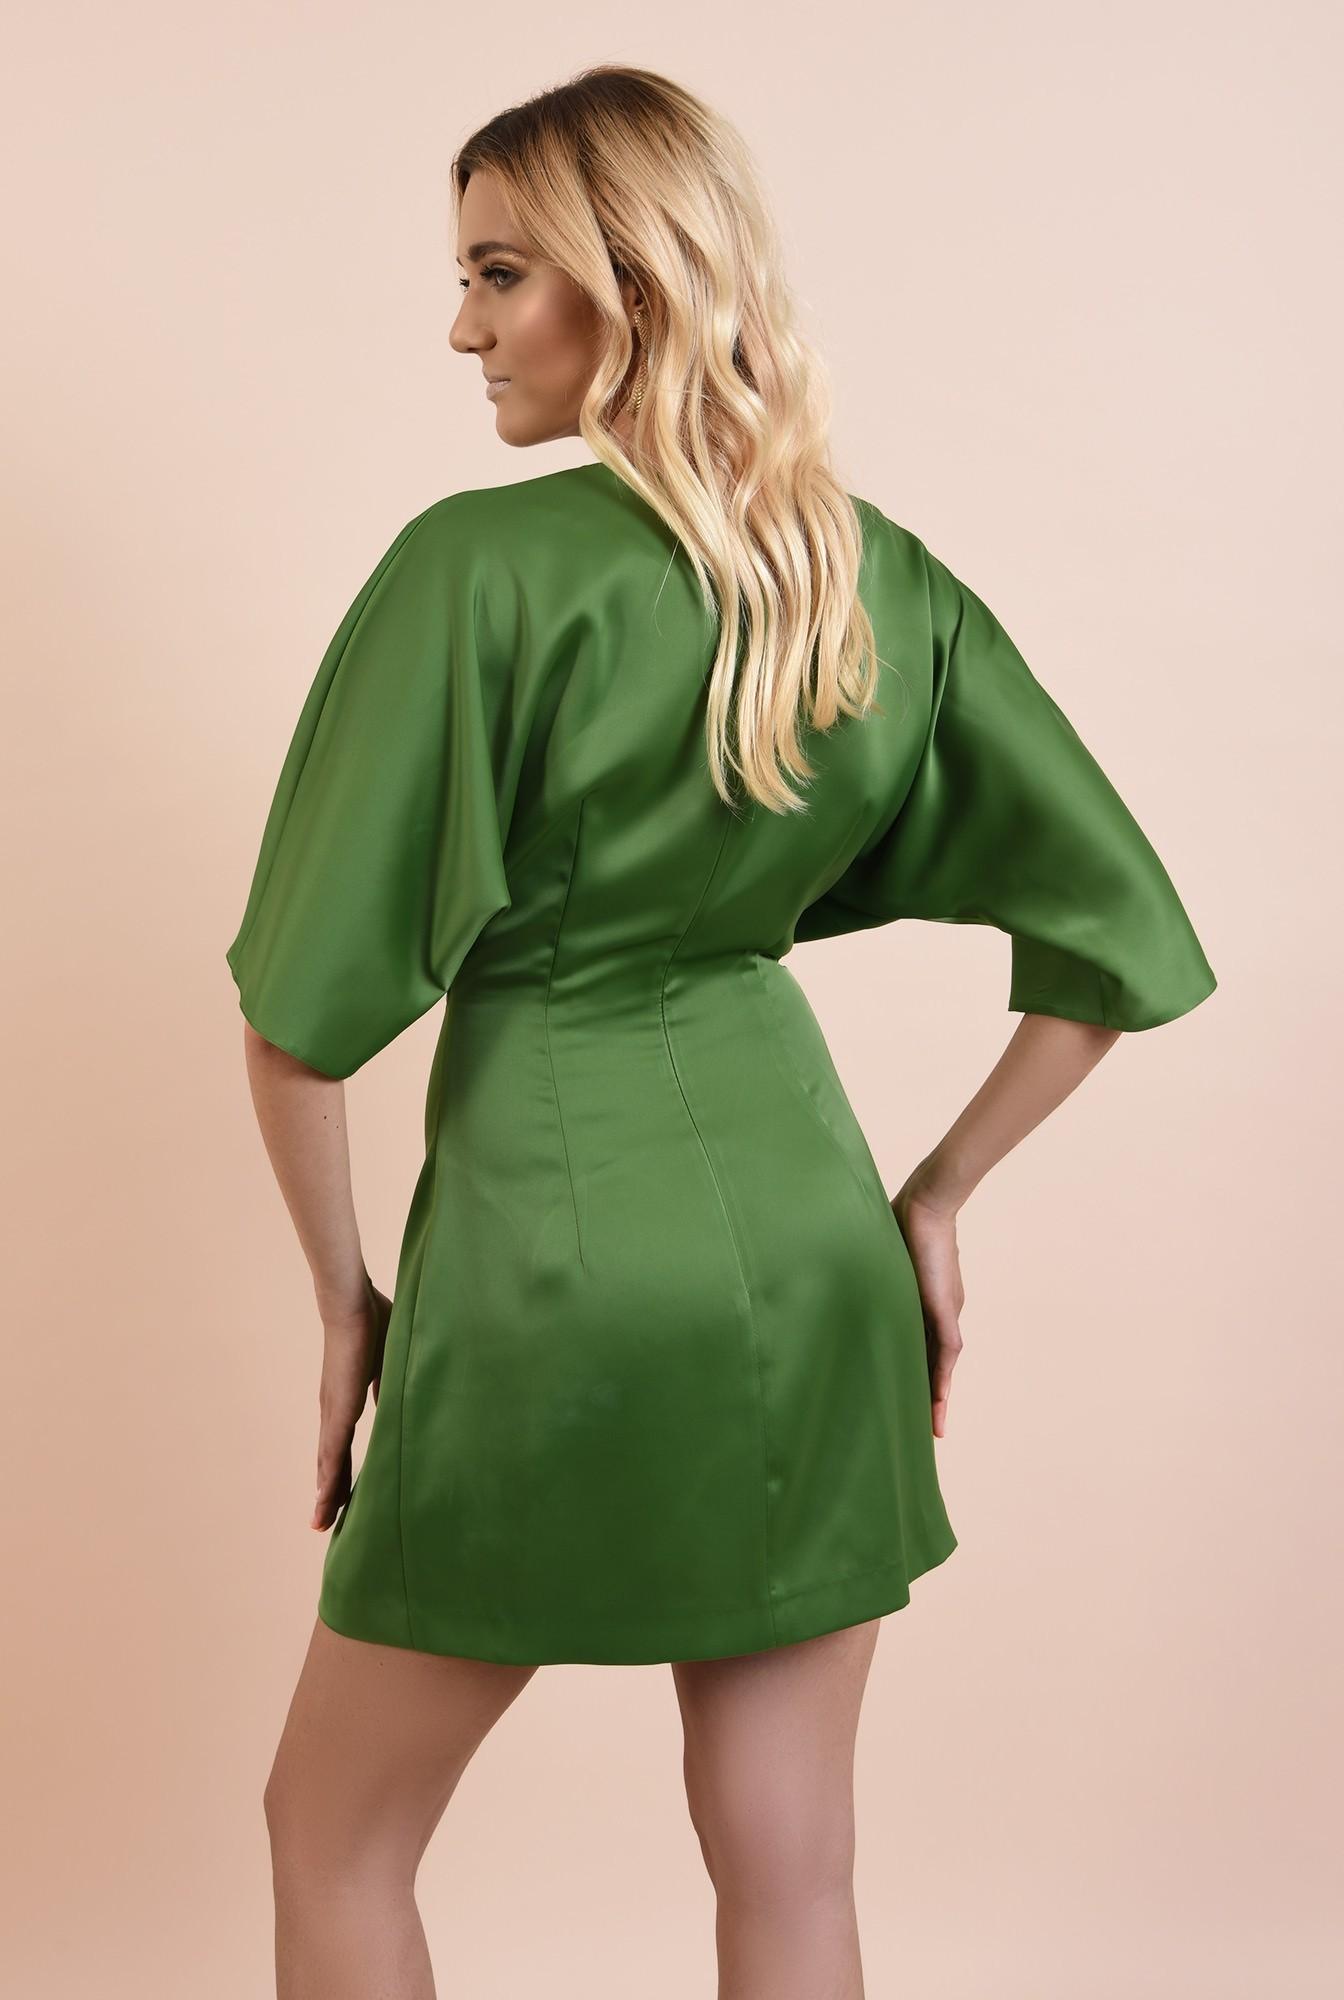 1 - rochie eleganta, verde, din satin, anchior petrecut, talie drapata